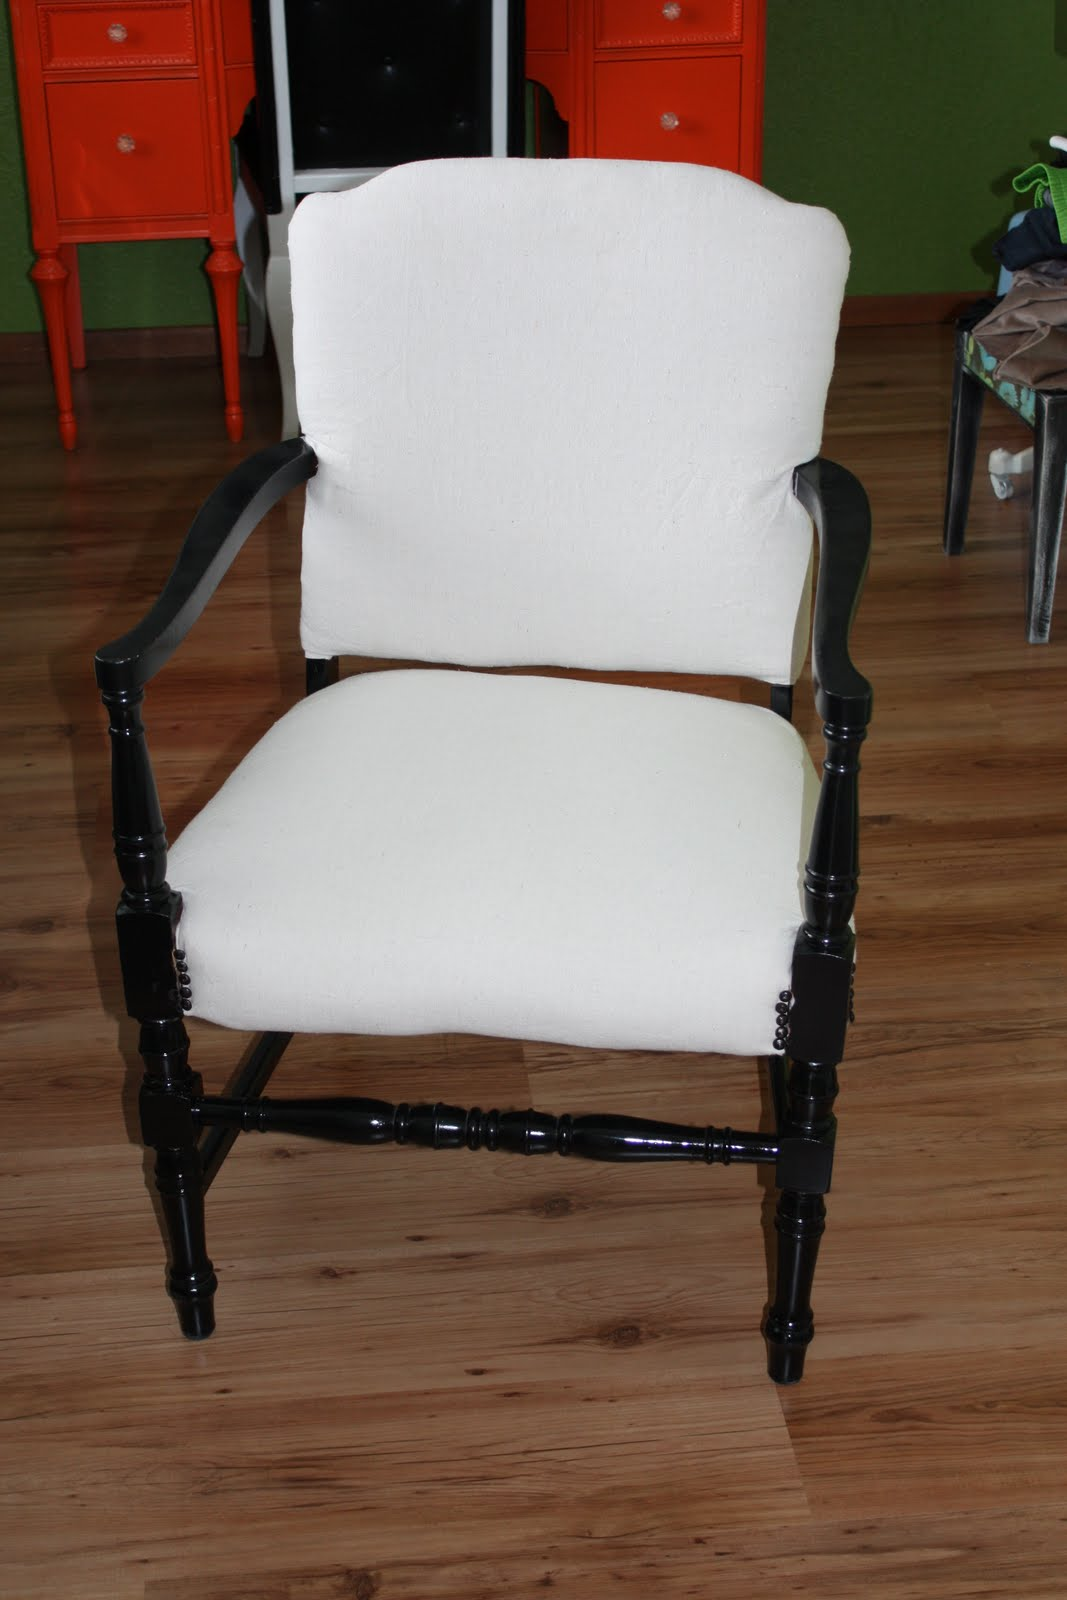 Design Stocker: Ugly Chair